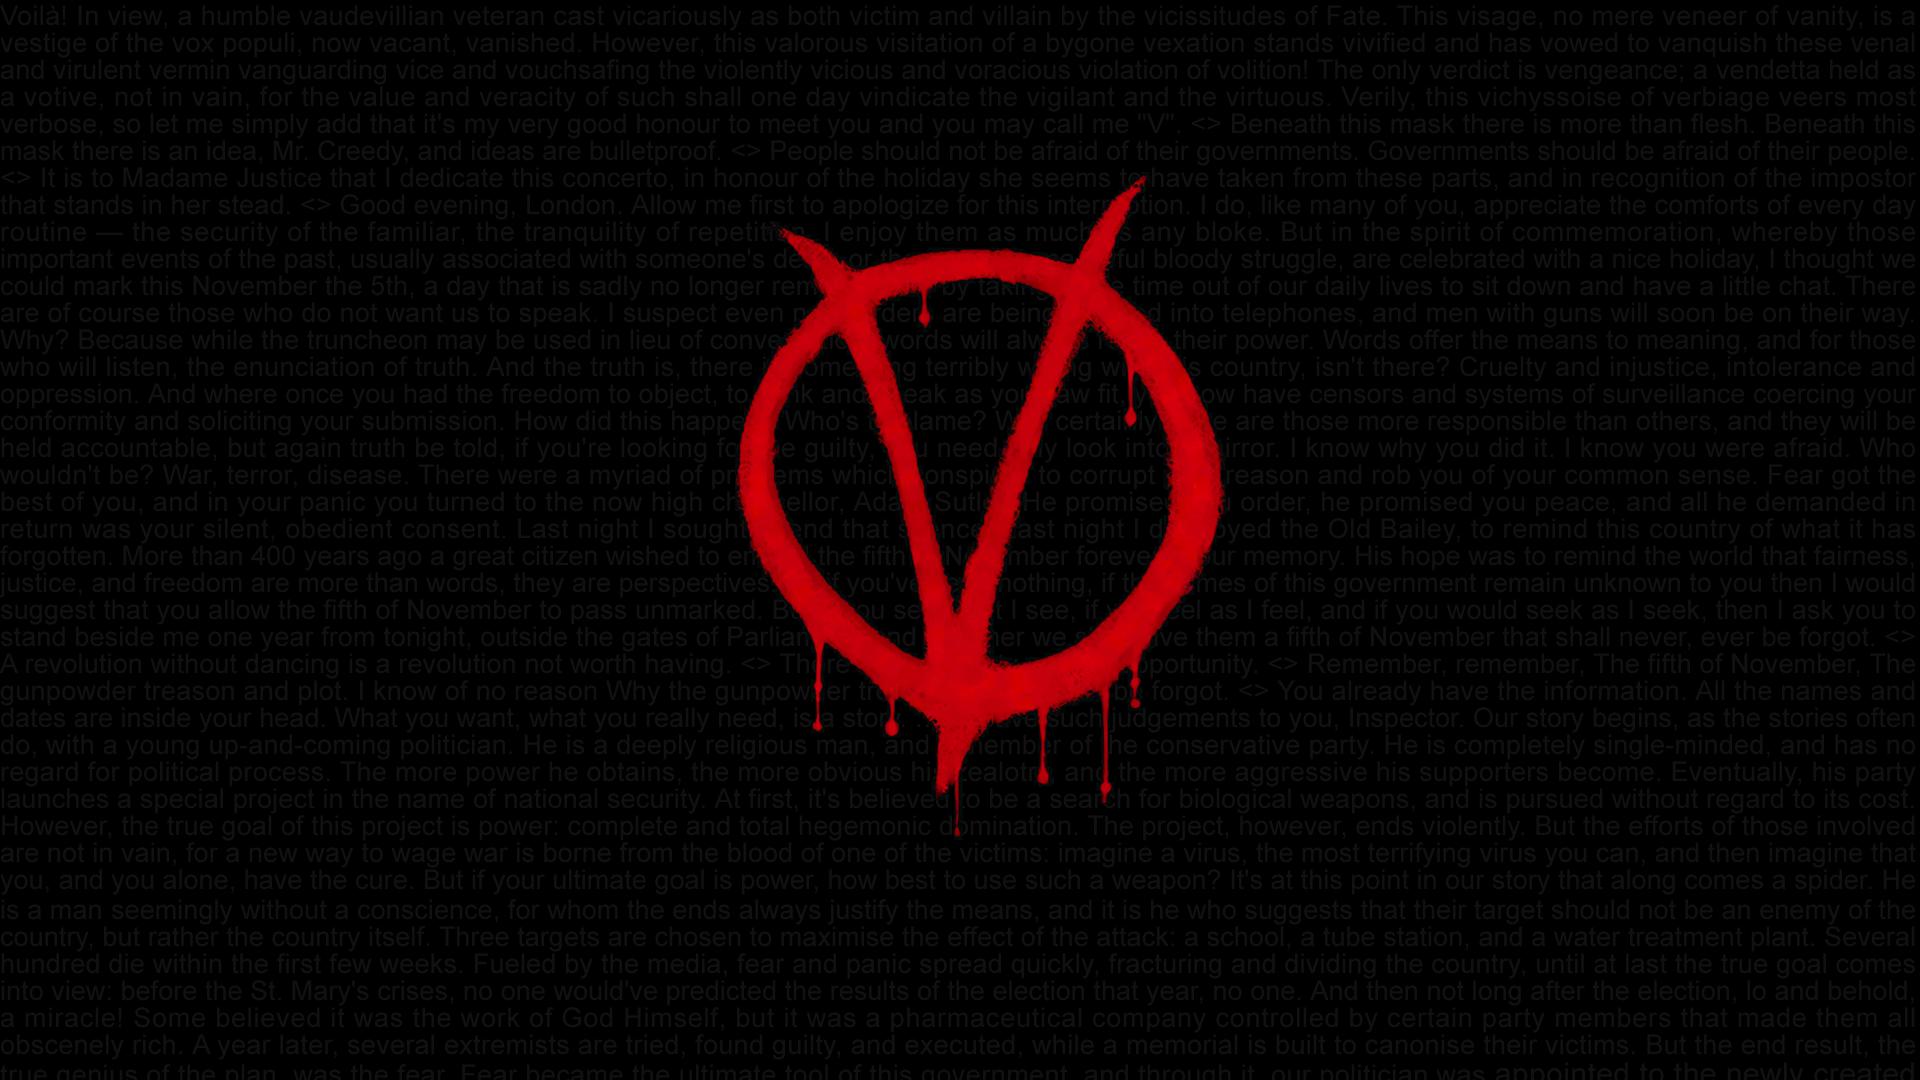 For Vendetta Wallpaper Hd wallpaper 1920x1080